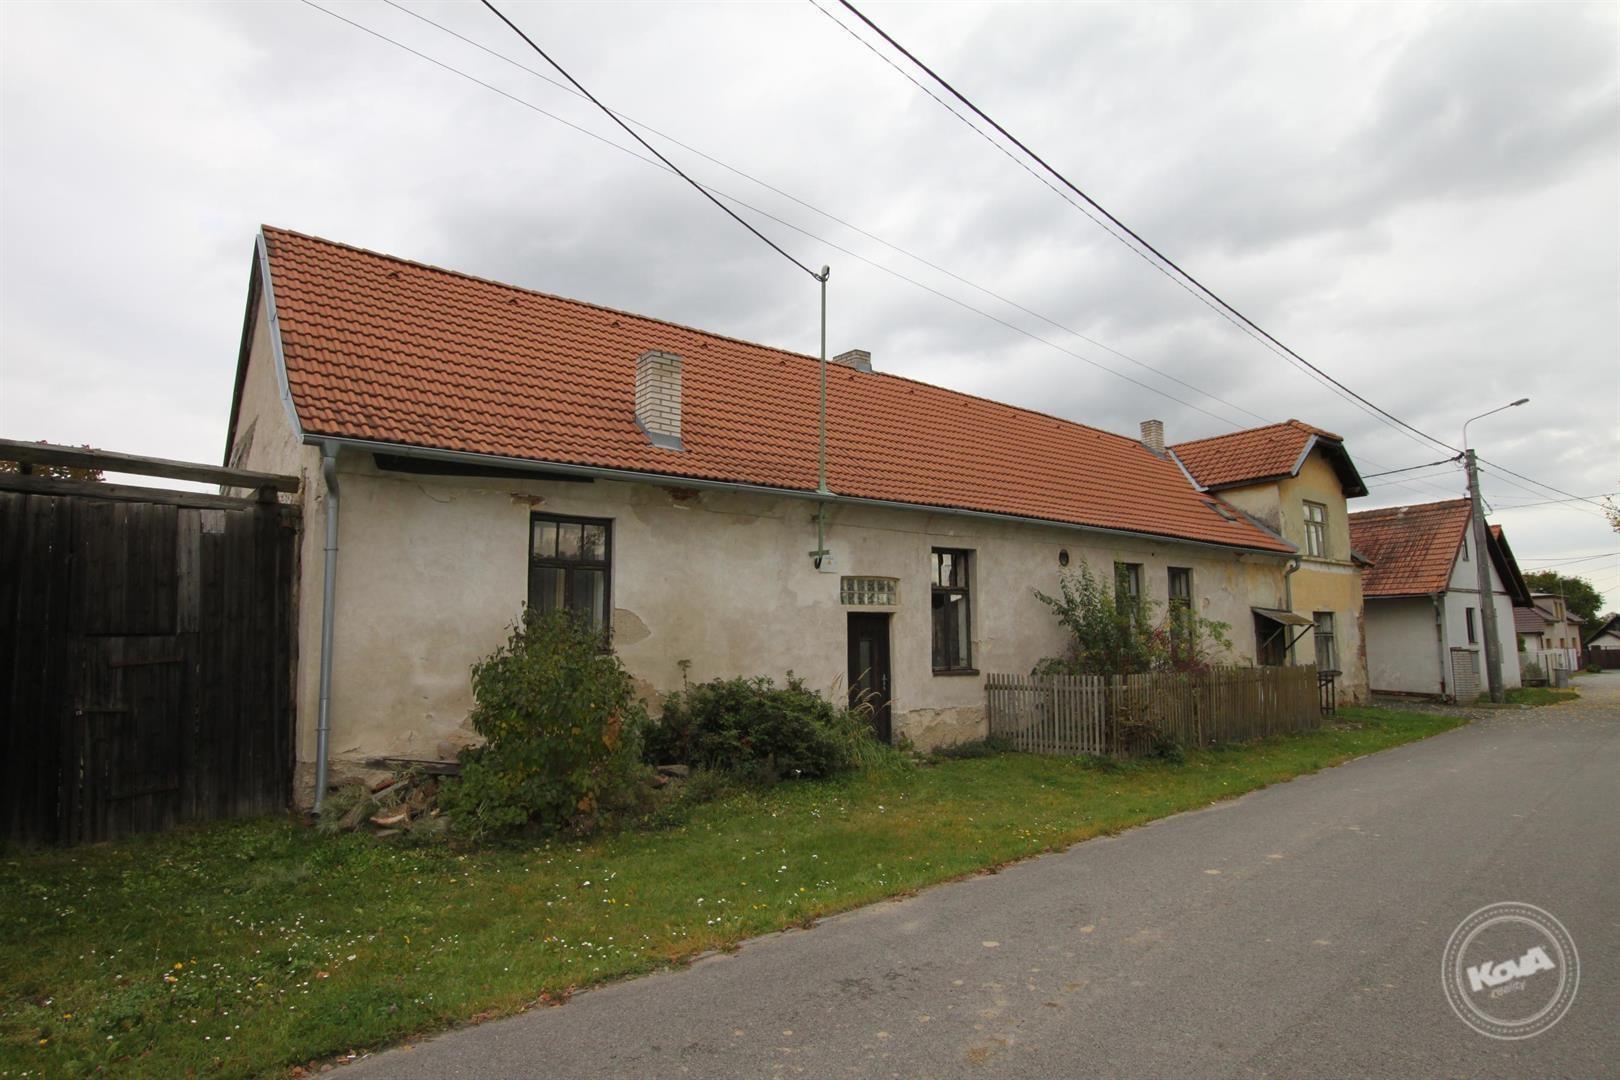 Prodej rodinného domu 270 m2 v klidné obci Rataje, okres Benešov.